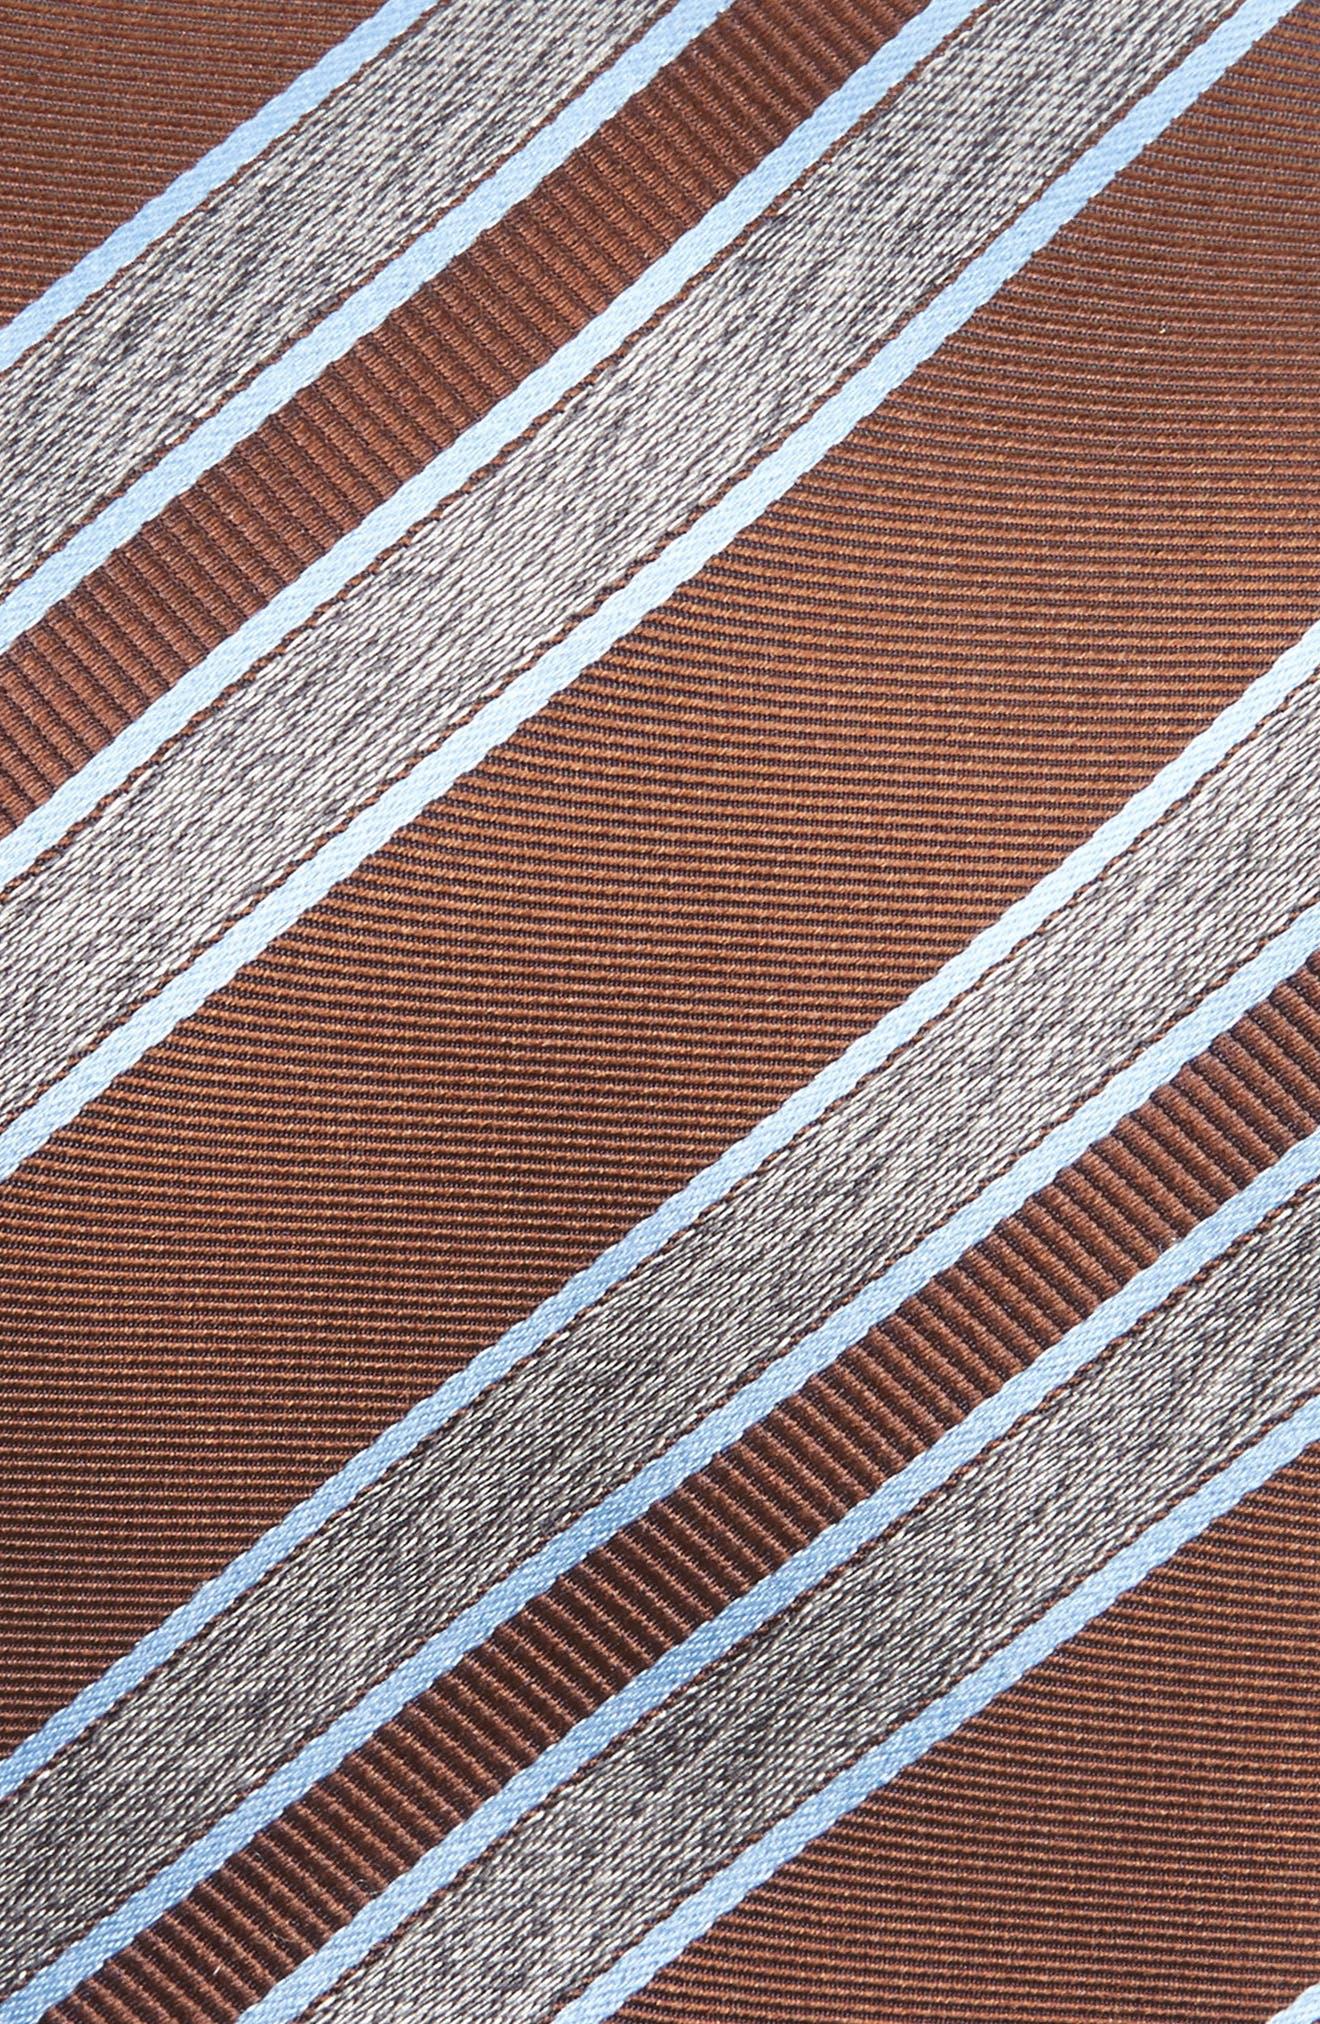 Stripe Silk Tie,                             Alternate thumbnail 2, color,                             Brown/ Grey